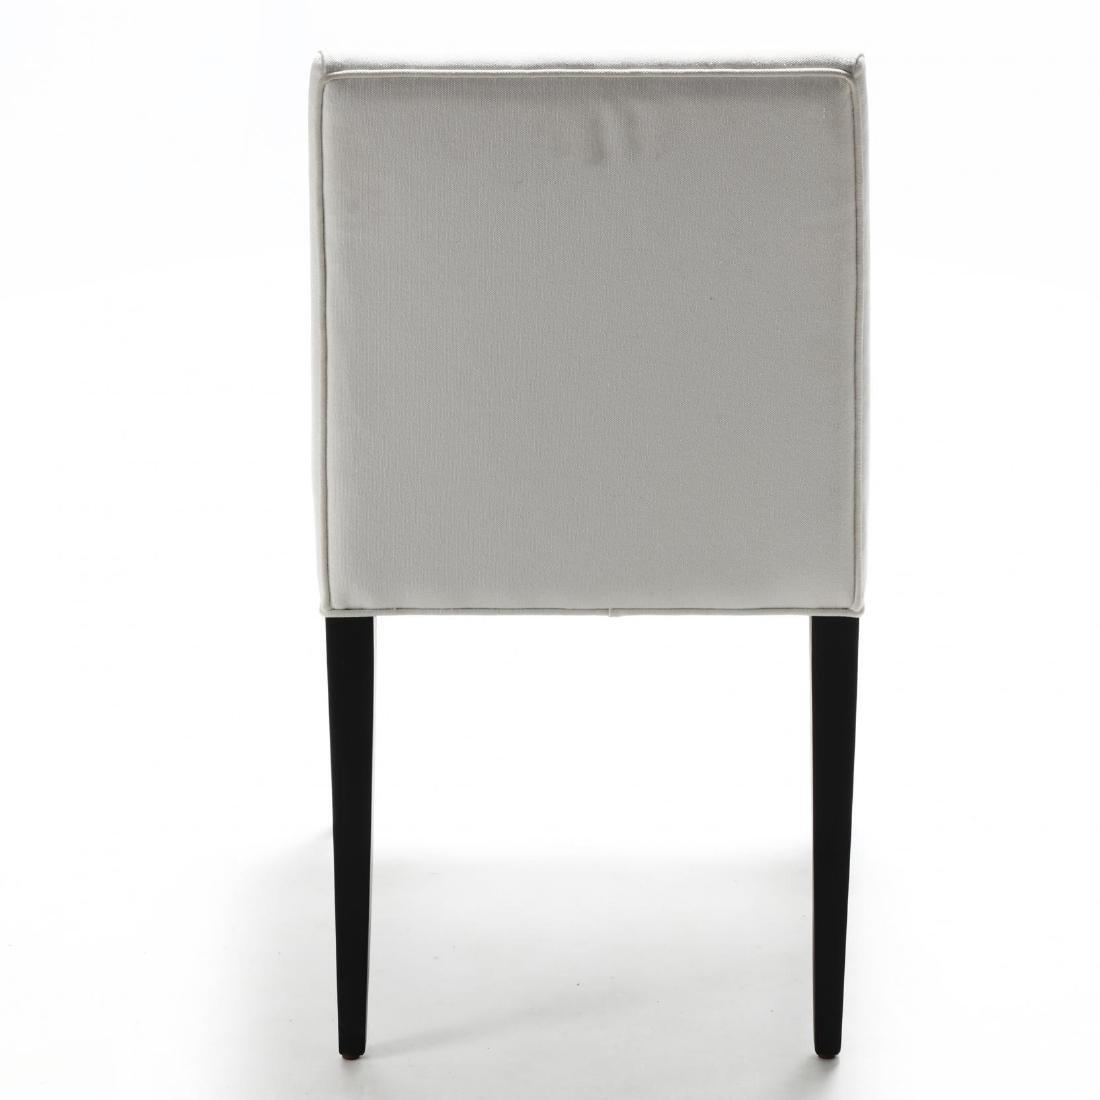 Kara Mann, Set of Four Contemporary Upholstered Dining - 5